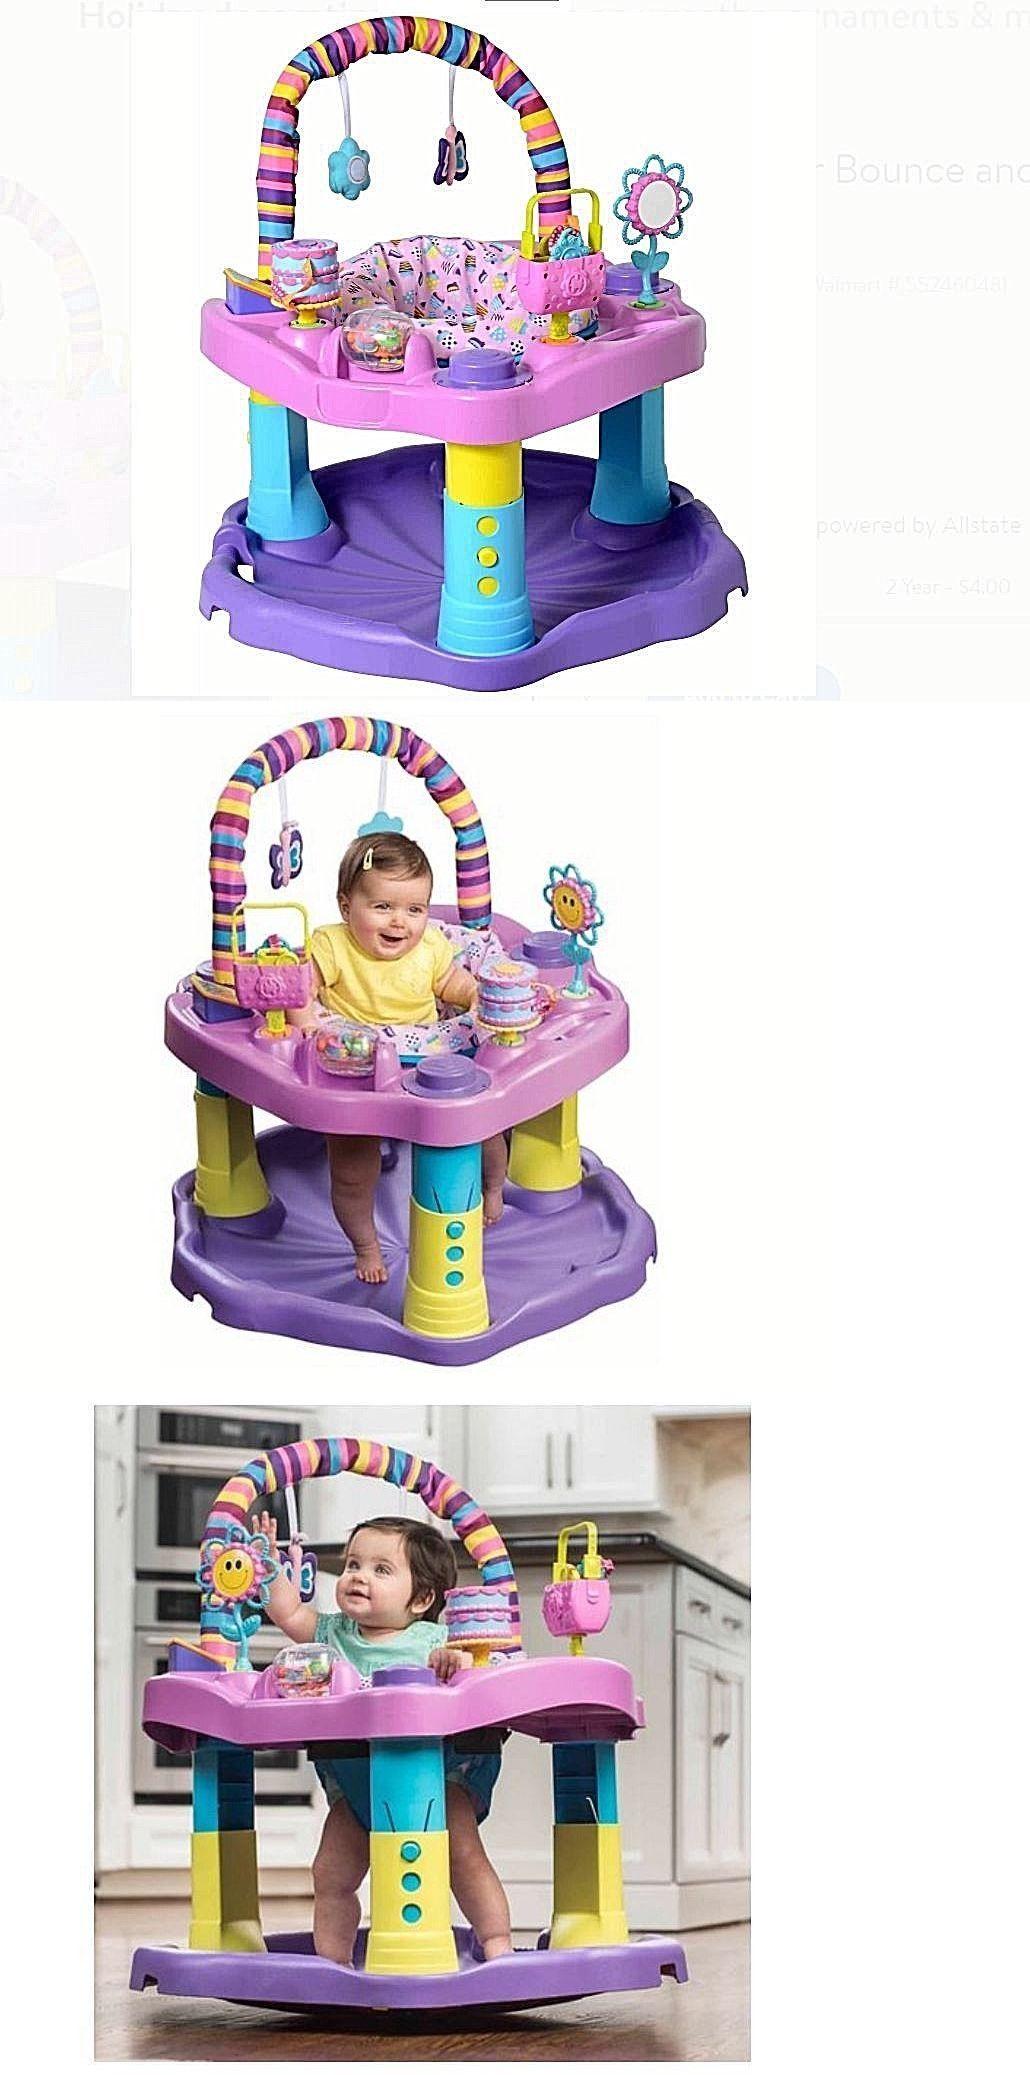 5991da7690c6 Activity Centers 20413  Evenflo Baby Exersaucer Activity Center Toy ...